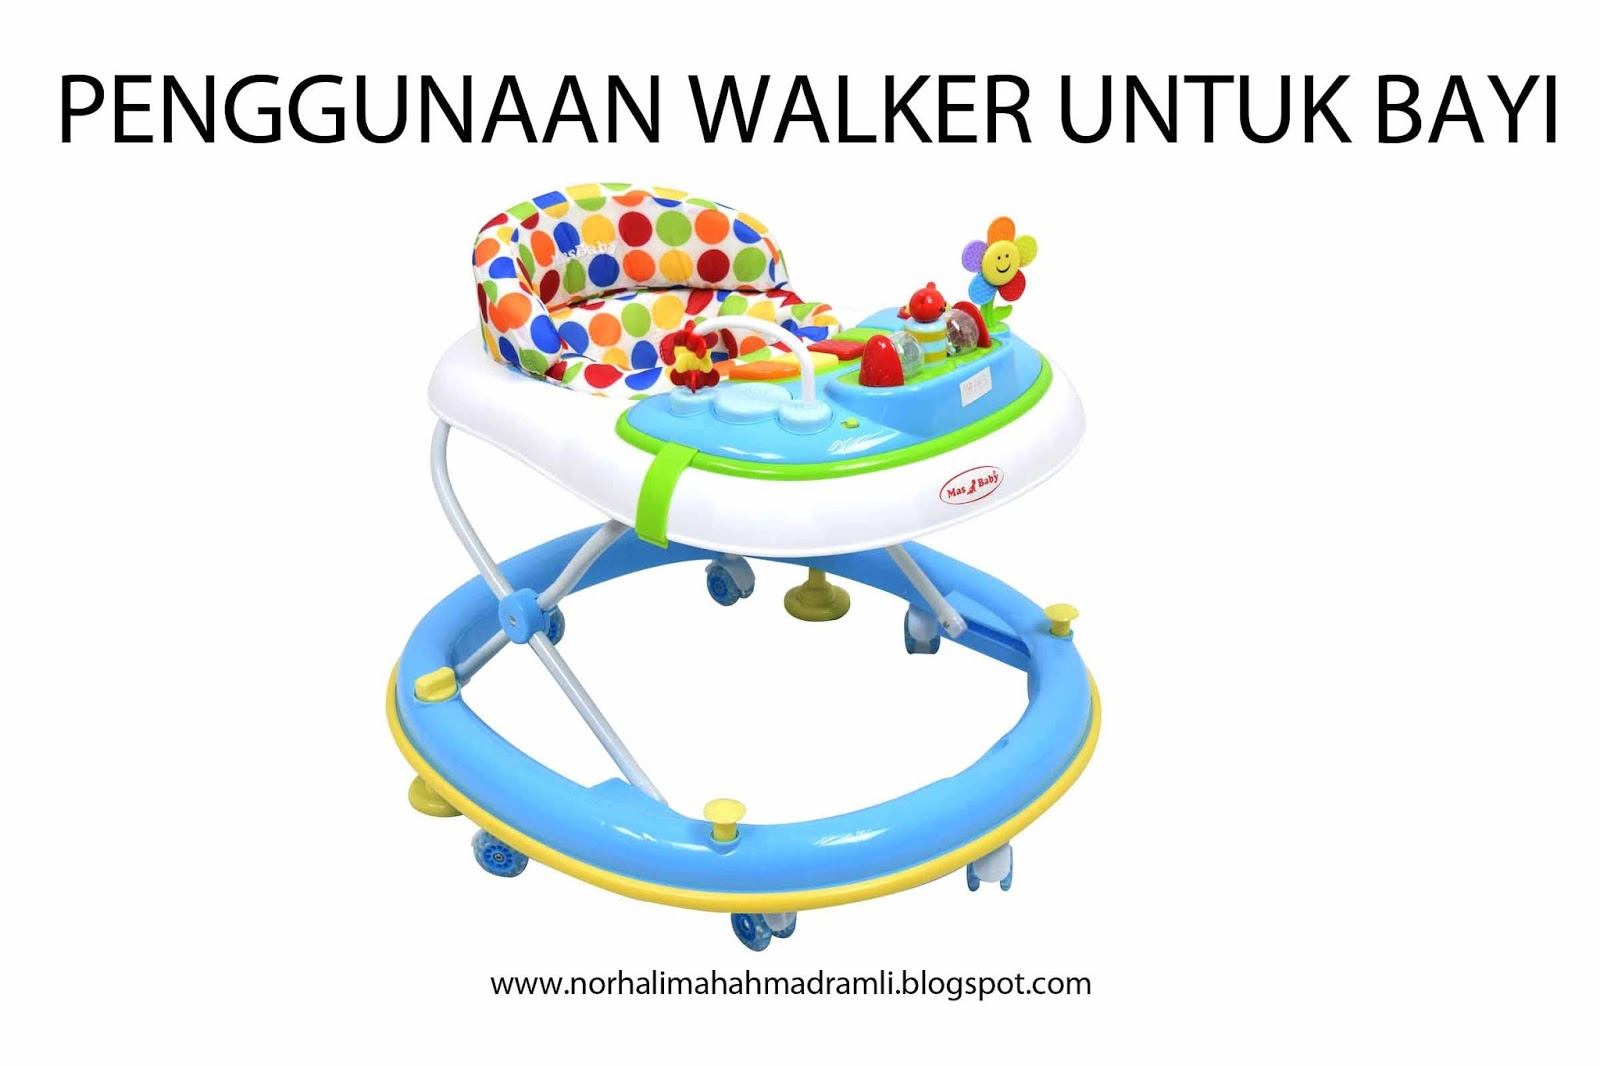 Penggunaan Walker Untuk Bayi. Ya Atau Tidak?